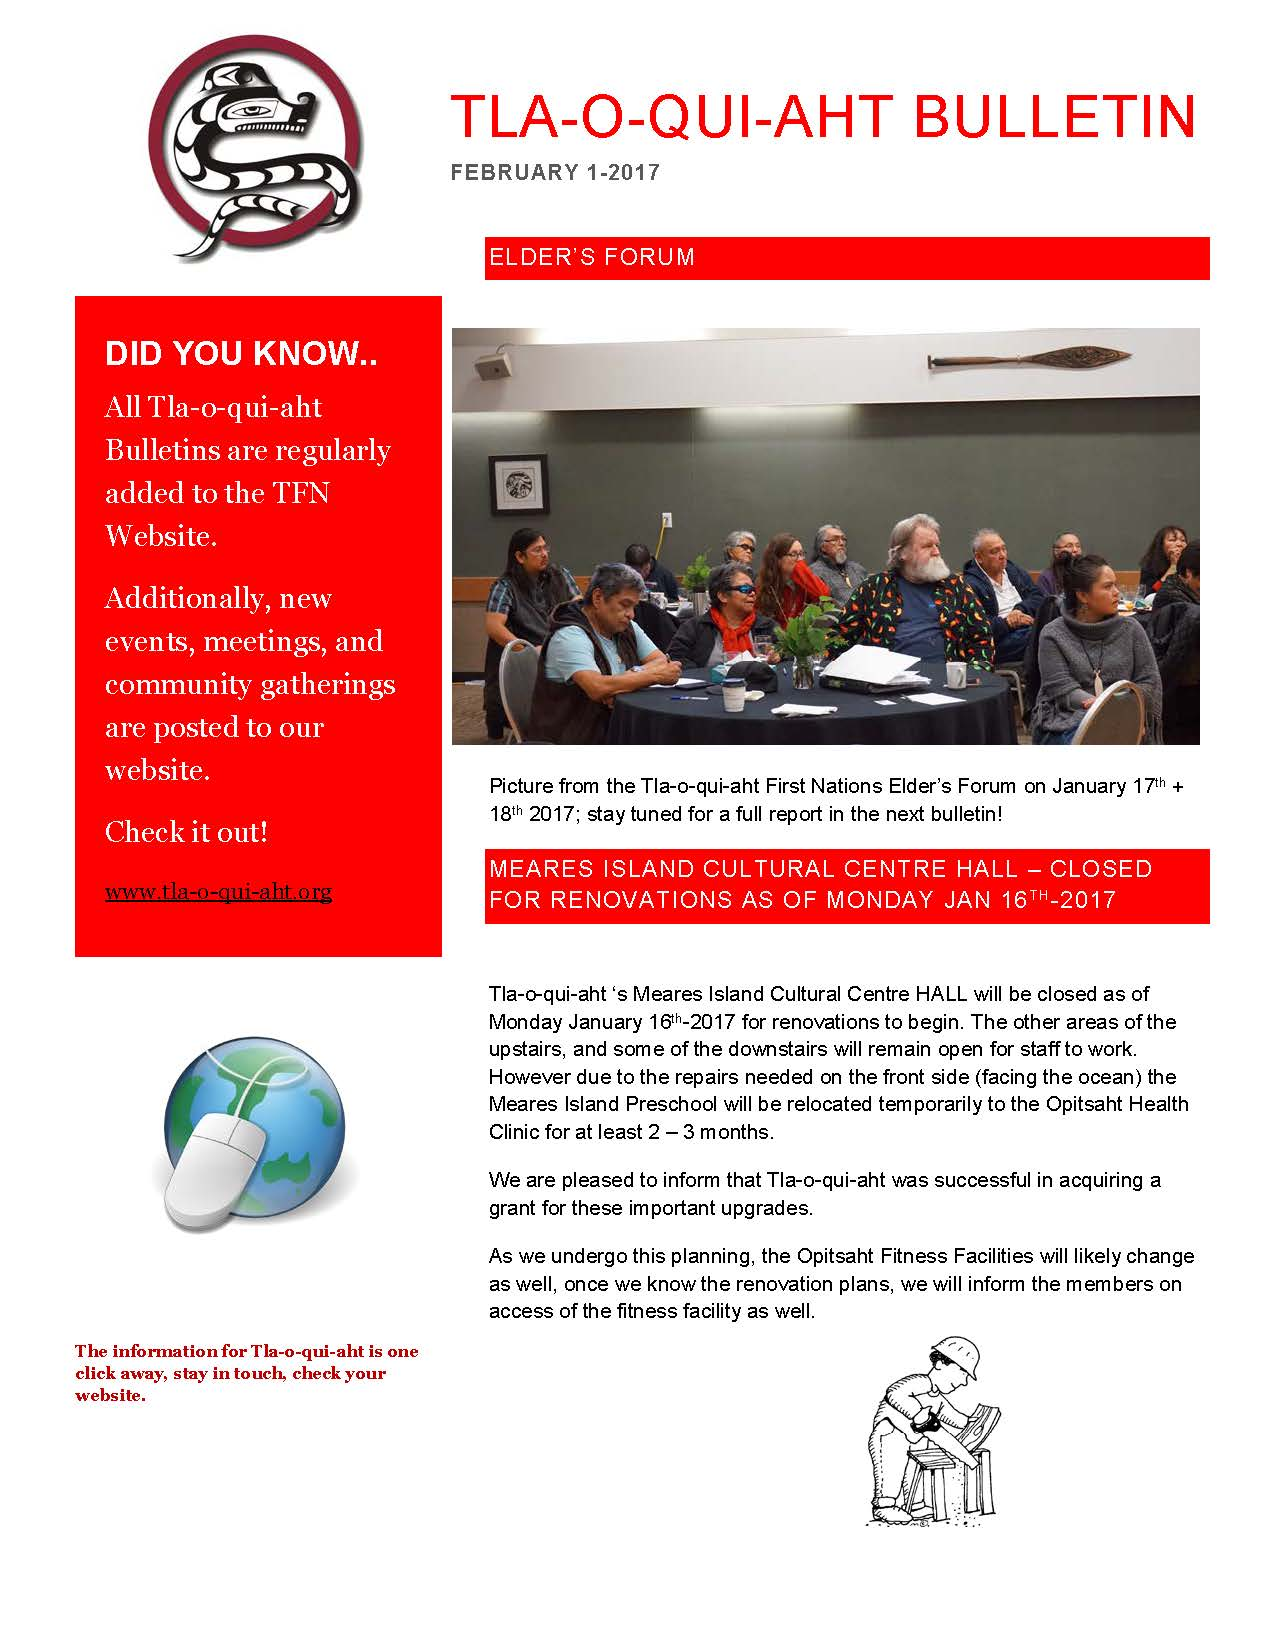 TFN Bulletin Feb1-2017_Page_01.jpg